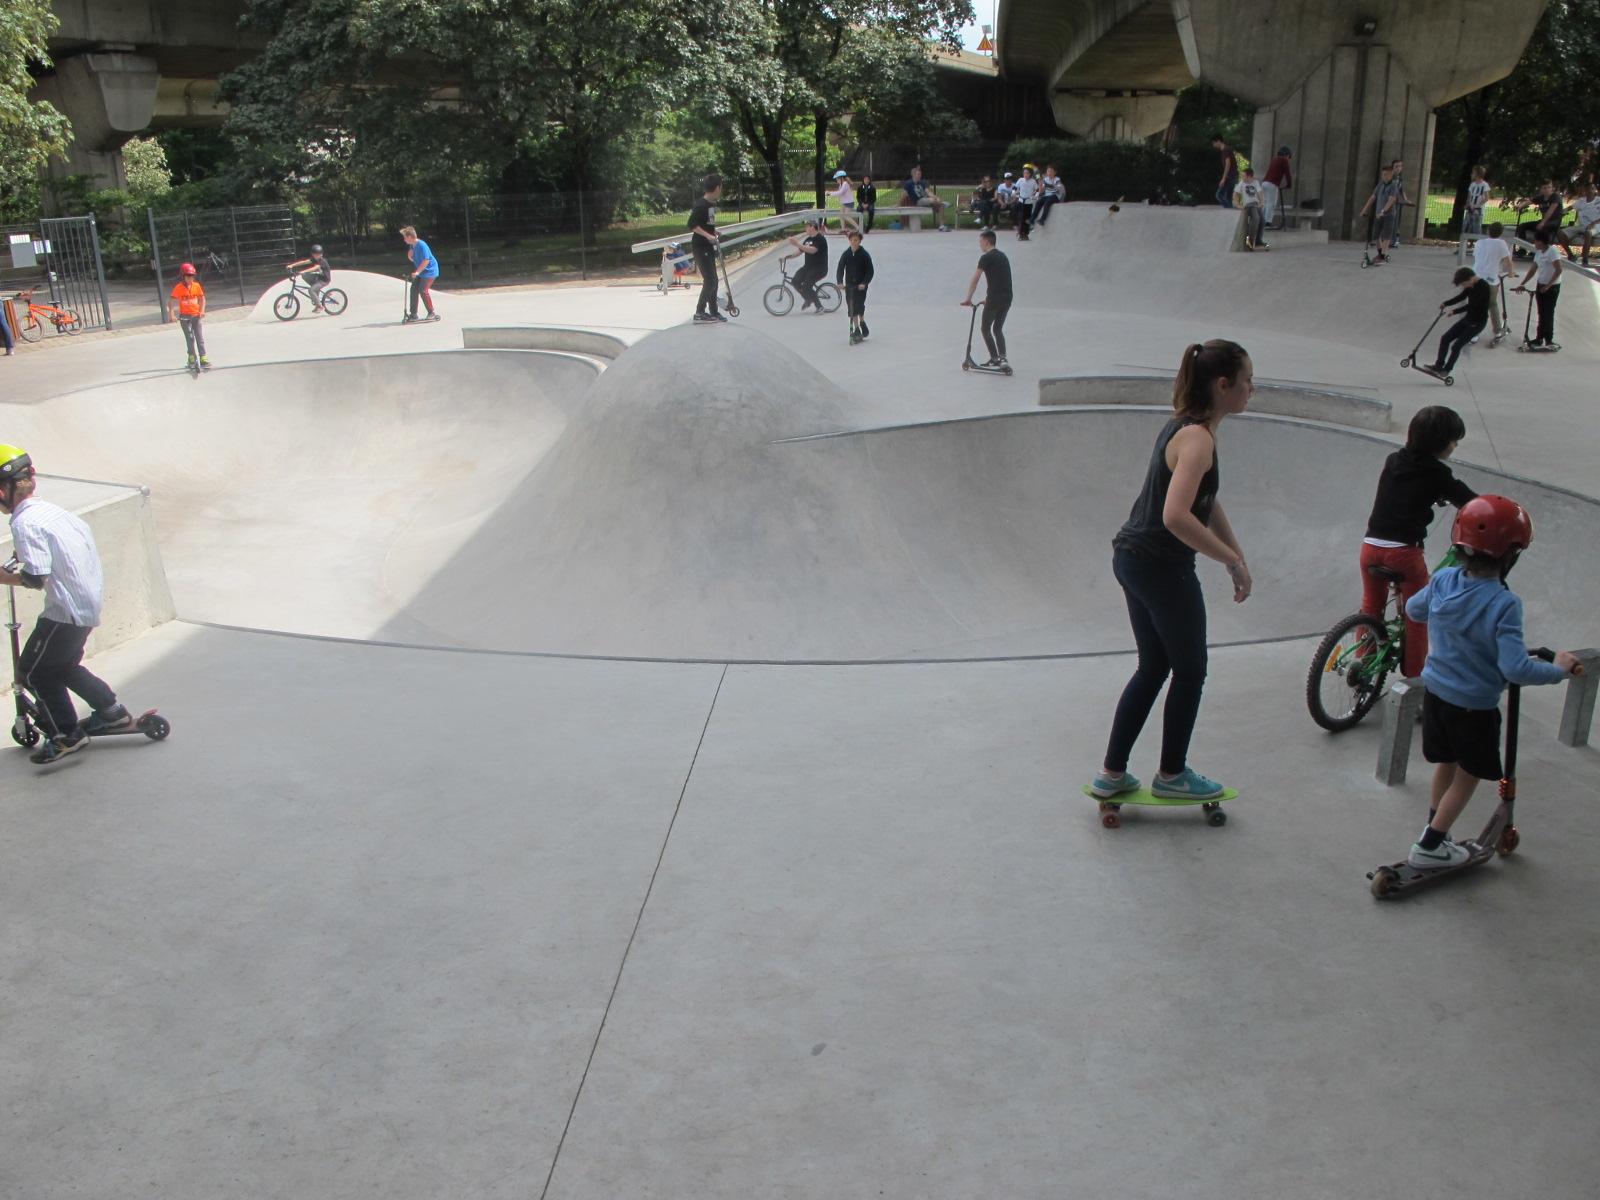 Maisons alfort a inaugur son skatepark 94 citoyens - Creer son skateboard ...